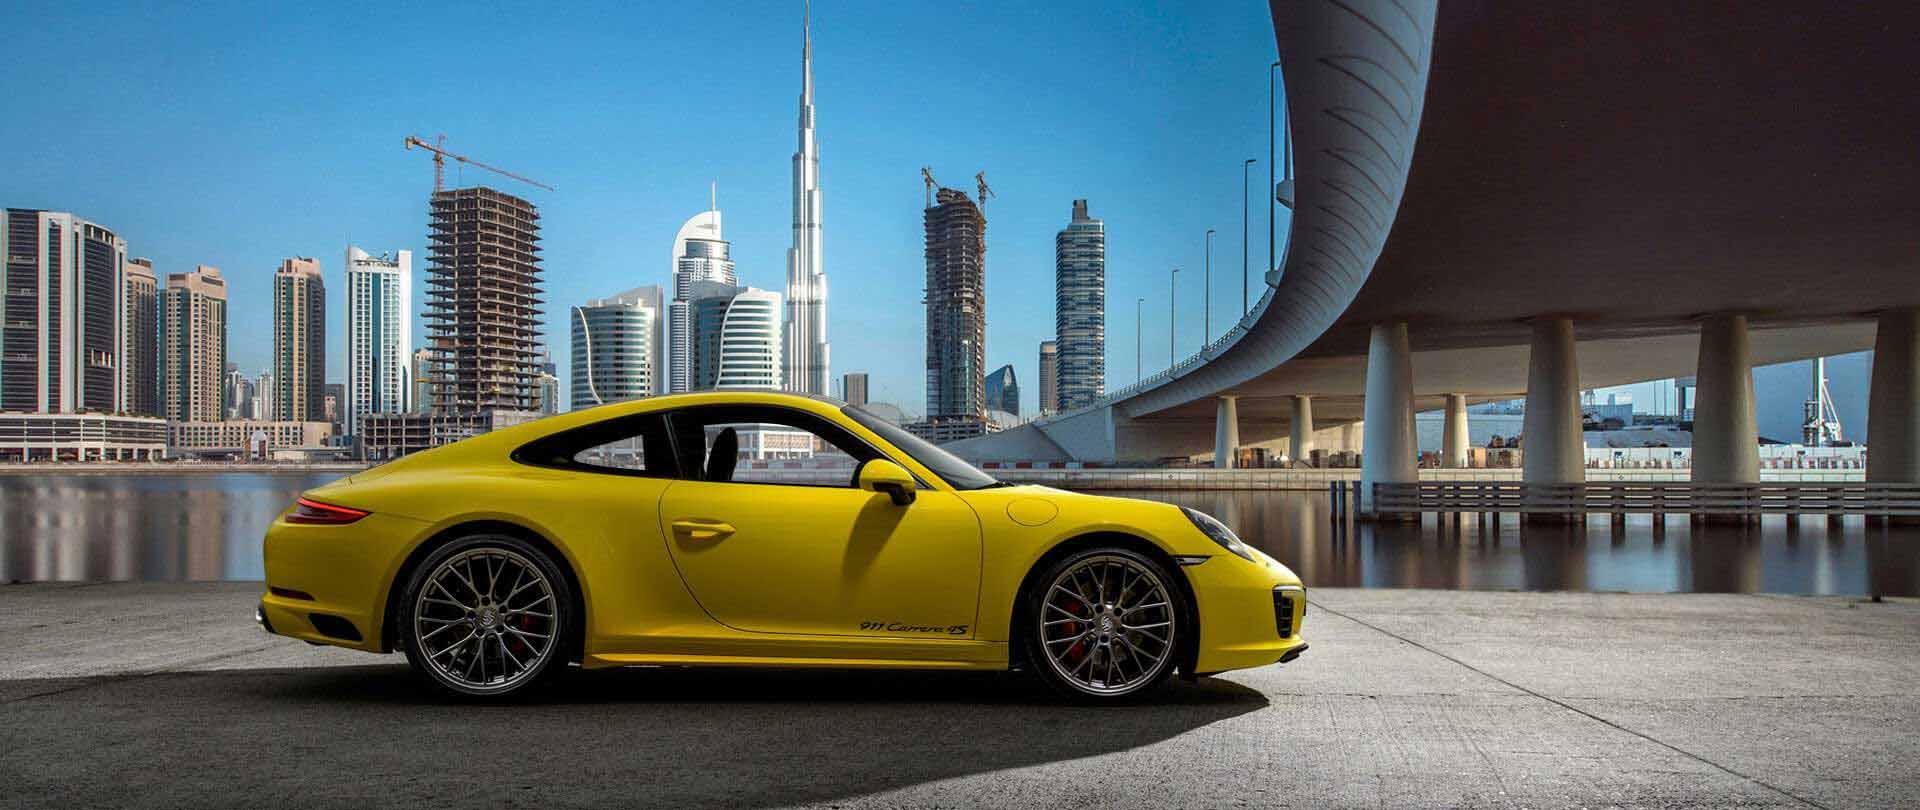 Rent an Exotic Car in Dubai